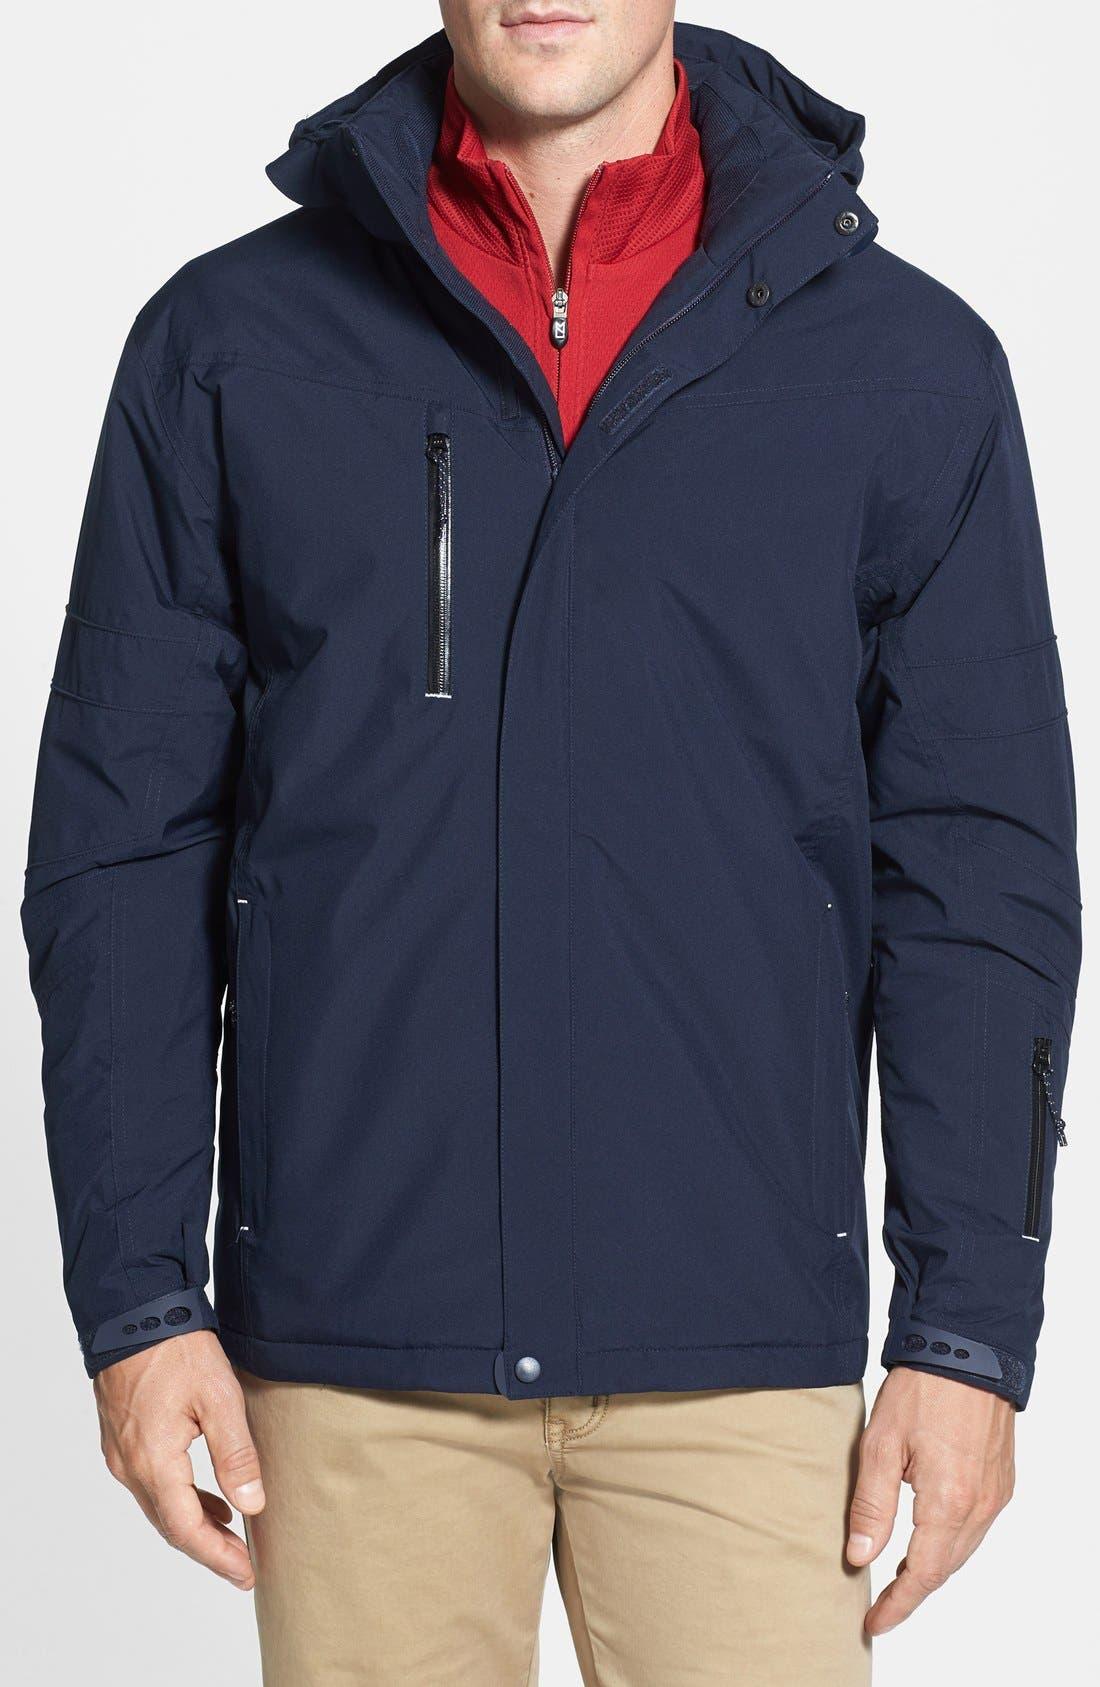 Alternate Image 1 Selected - Cutter & Buck WeatherTec Sanders Jacket (Big & Tall)